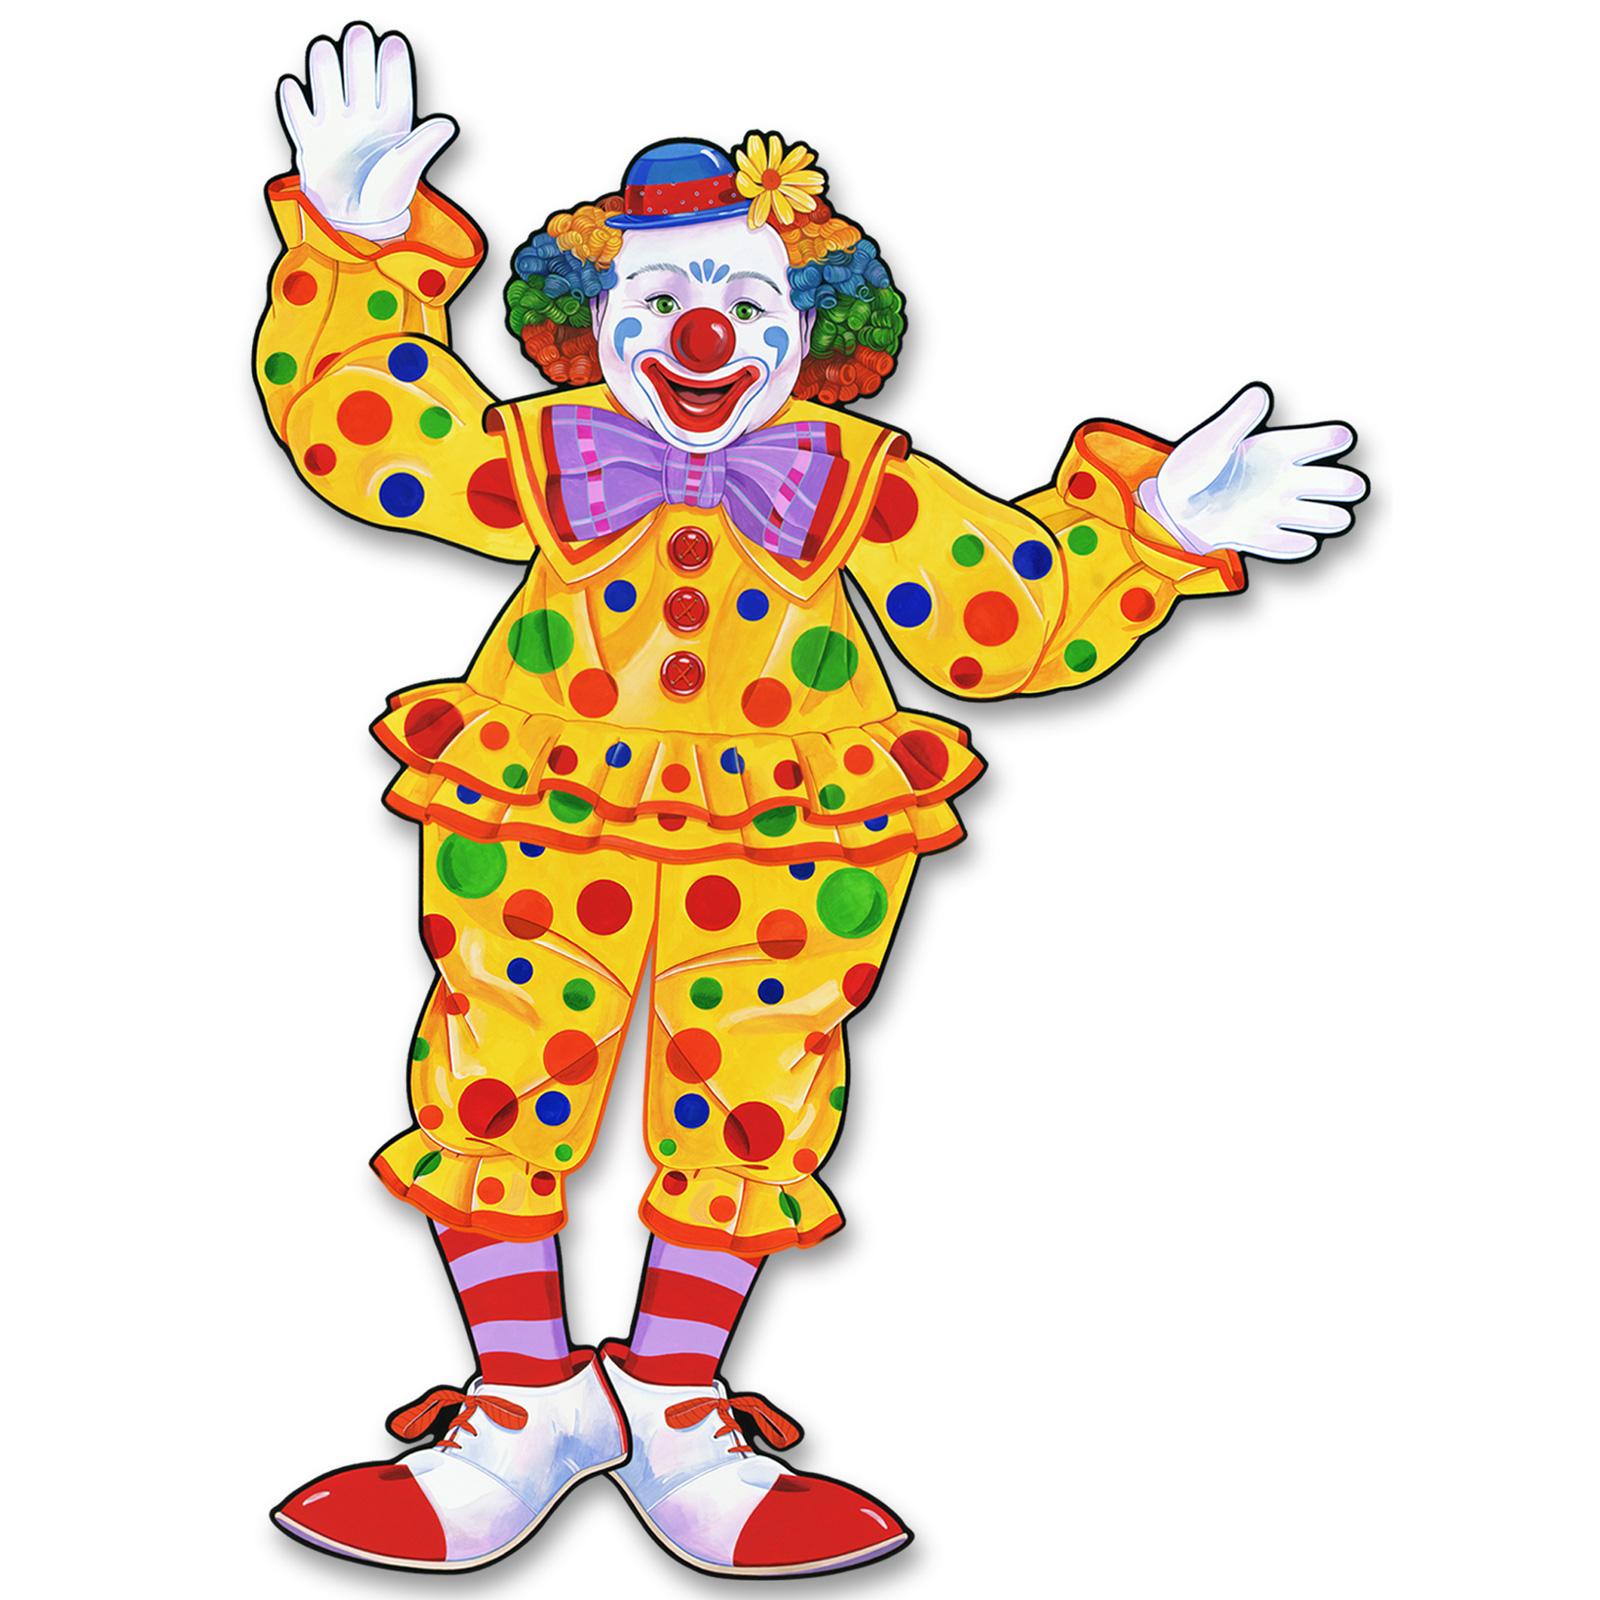 Circus joker clipart clipart transparent download Circus joker clipart - ClipartFest clipart transparent download